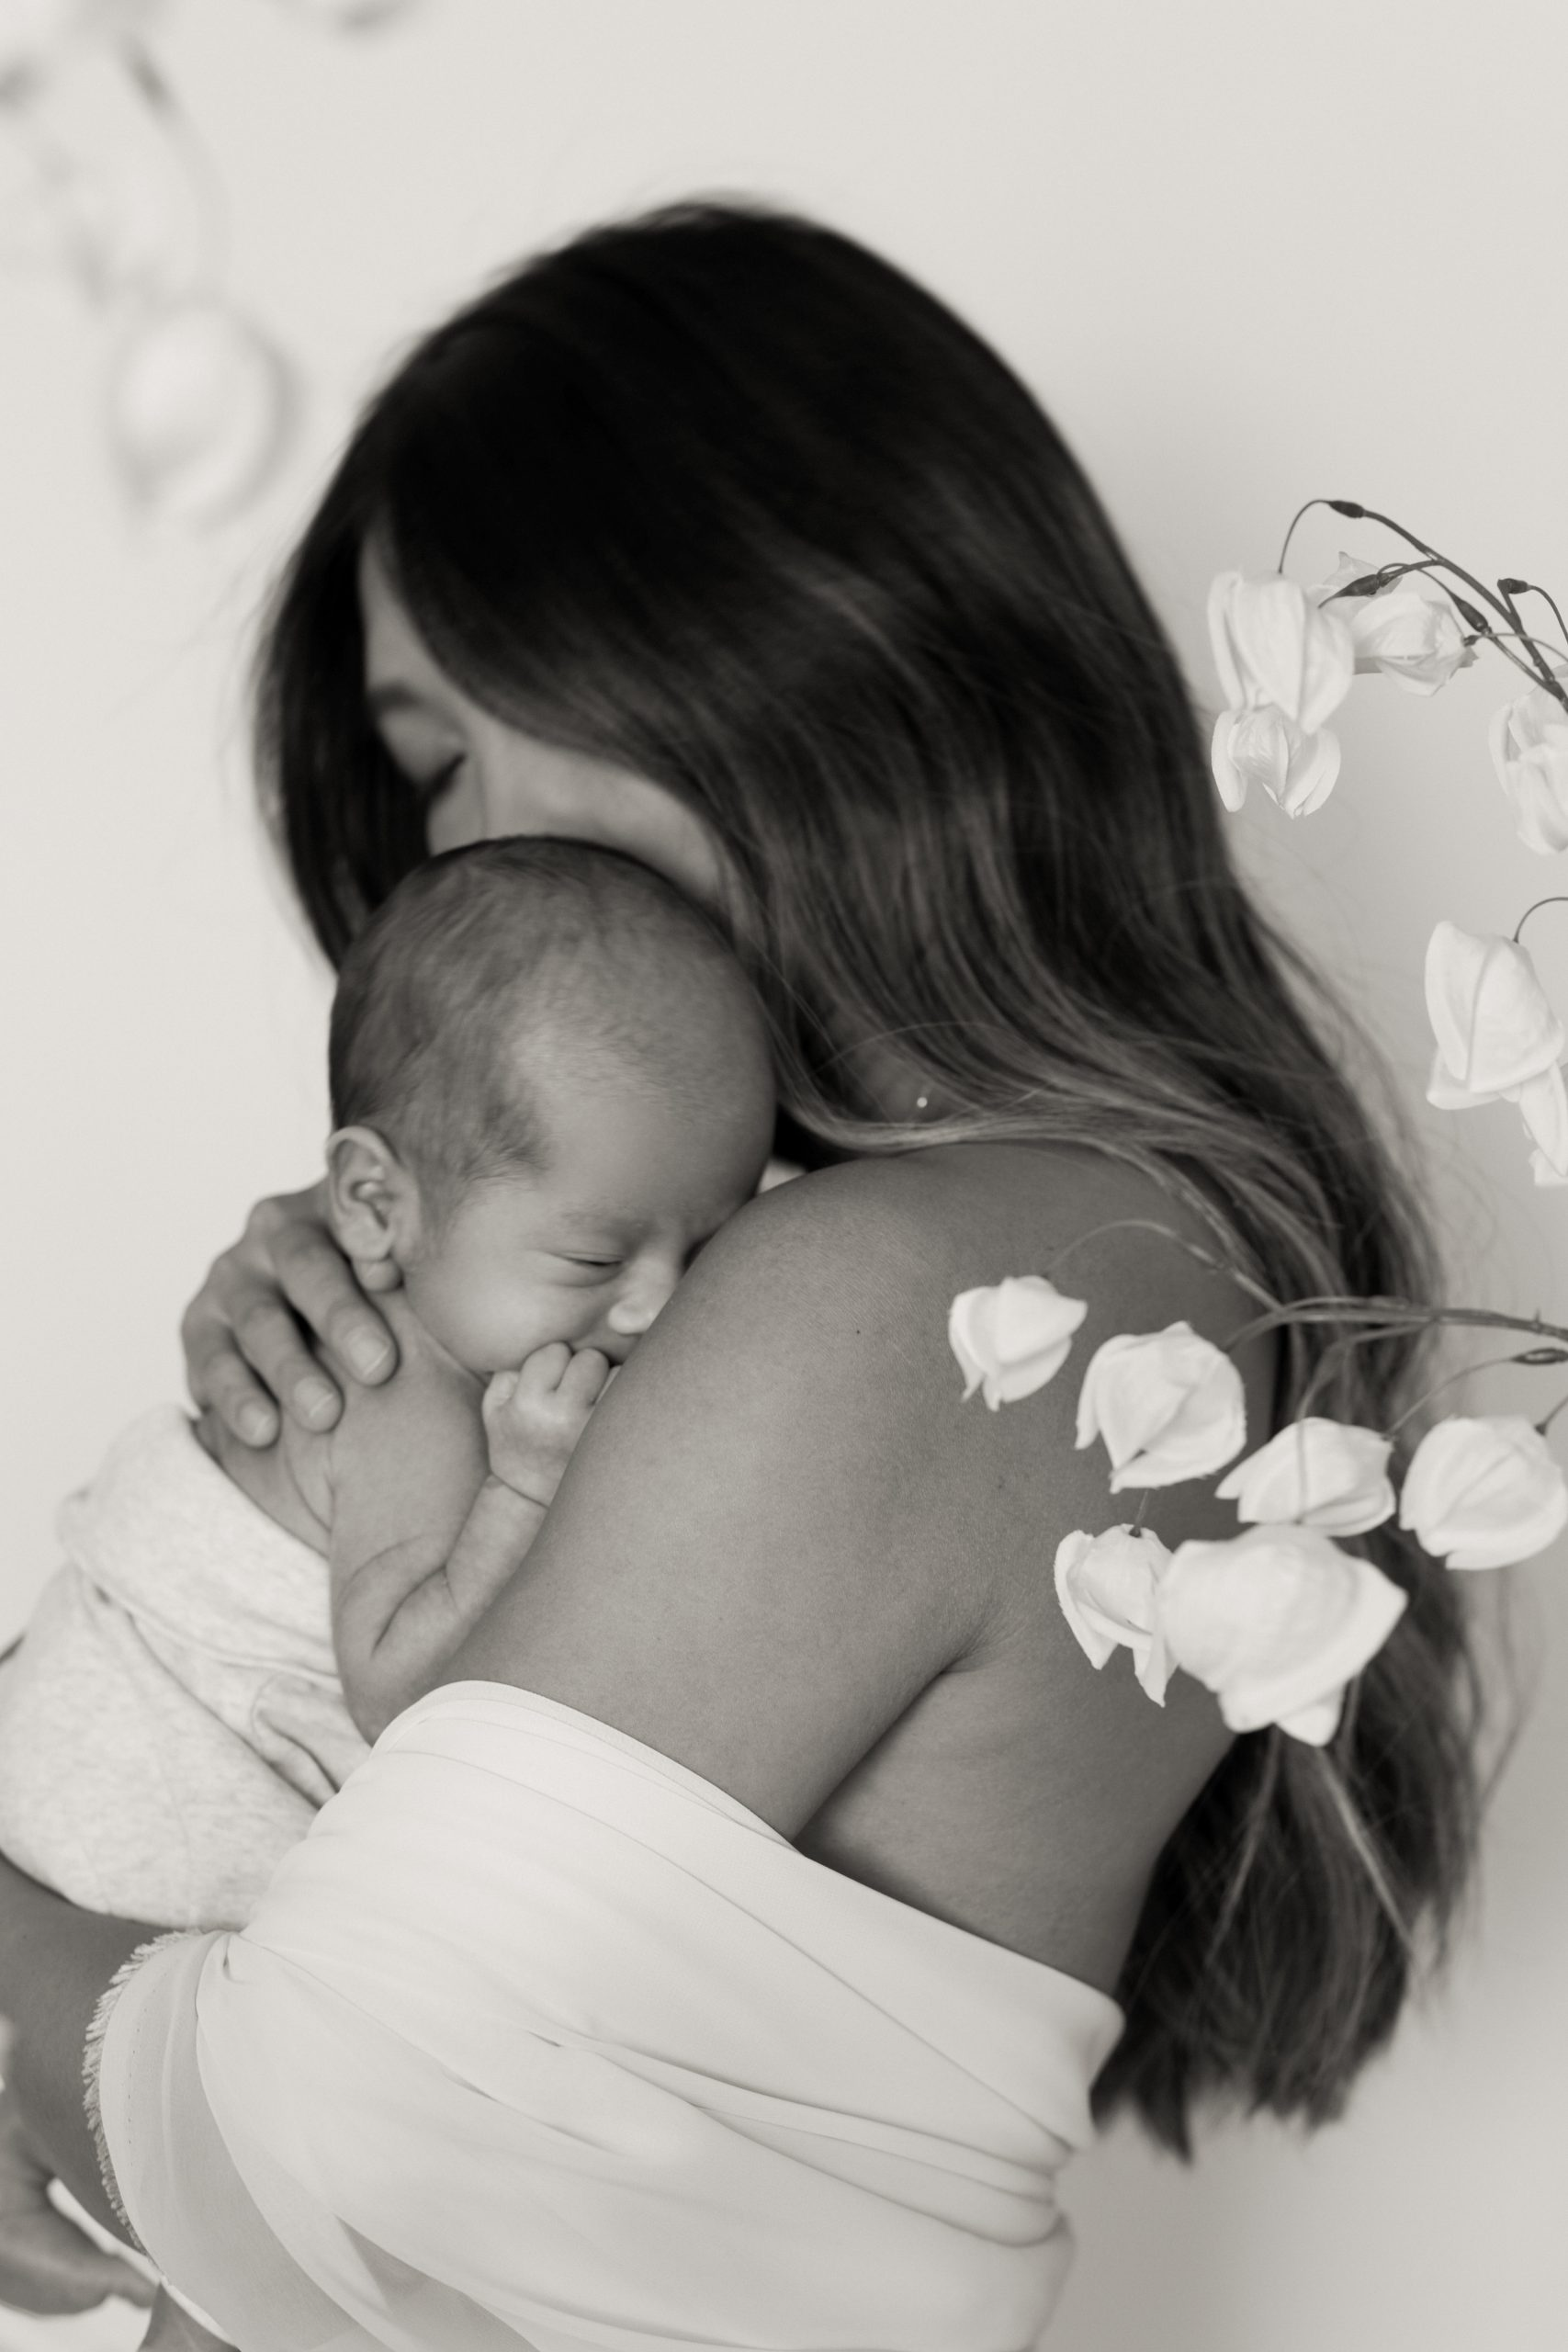 Luela Kaba Photography | Maternity Photography | Newborn Photography | Boudoir Photography | Mom & Baby Photos